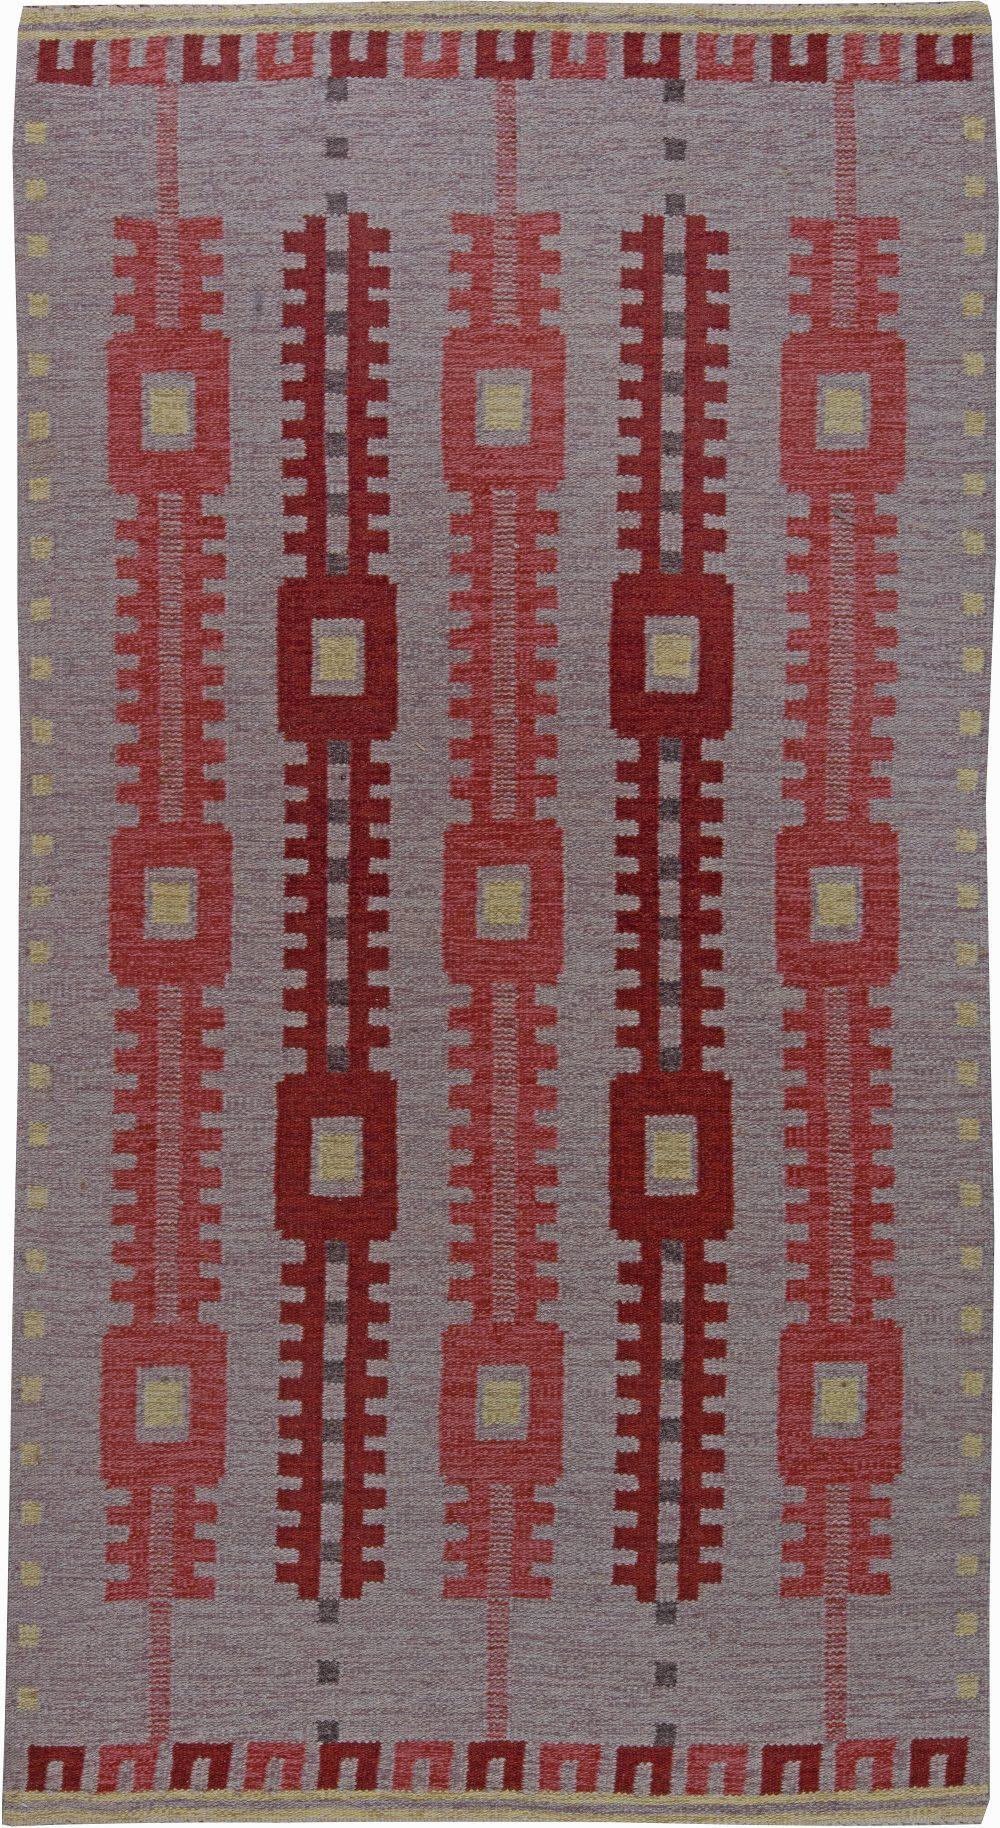 Vintage Swedish Flat Weave Rug BB6240